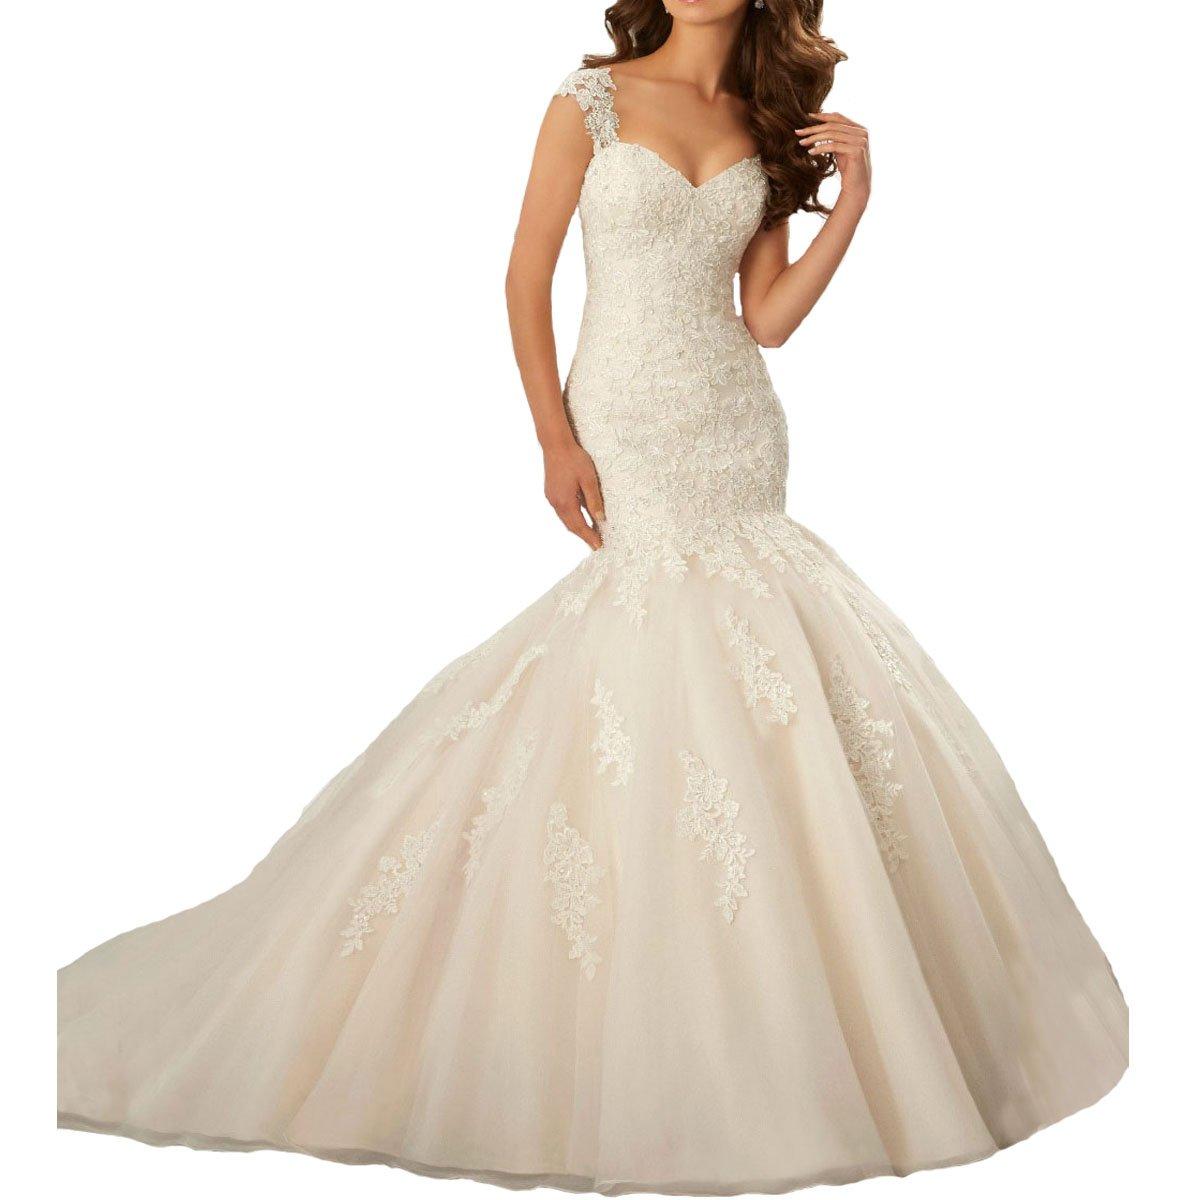 Fair Lady Women's Cap Sleeves Mermaid Lace Backless Wedding Dresses Bridal 2017 Long(White,4)